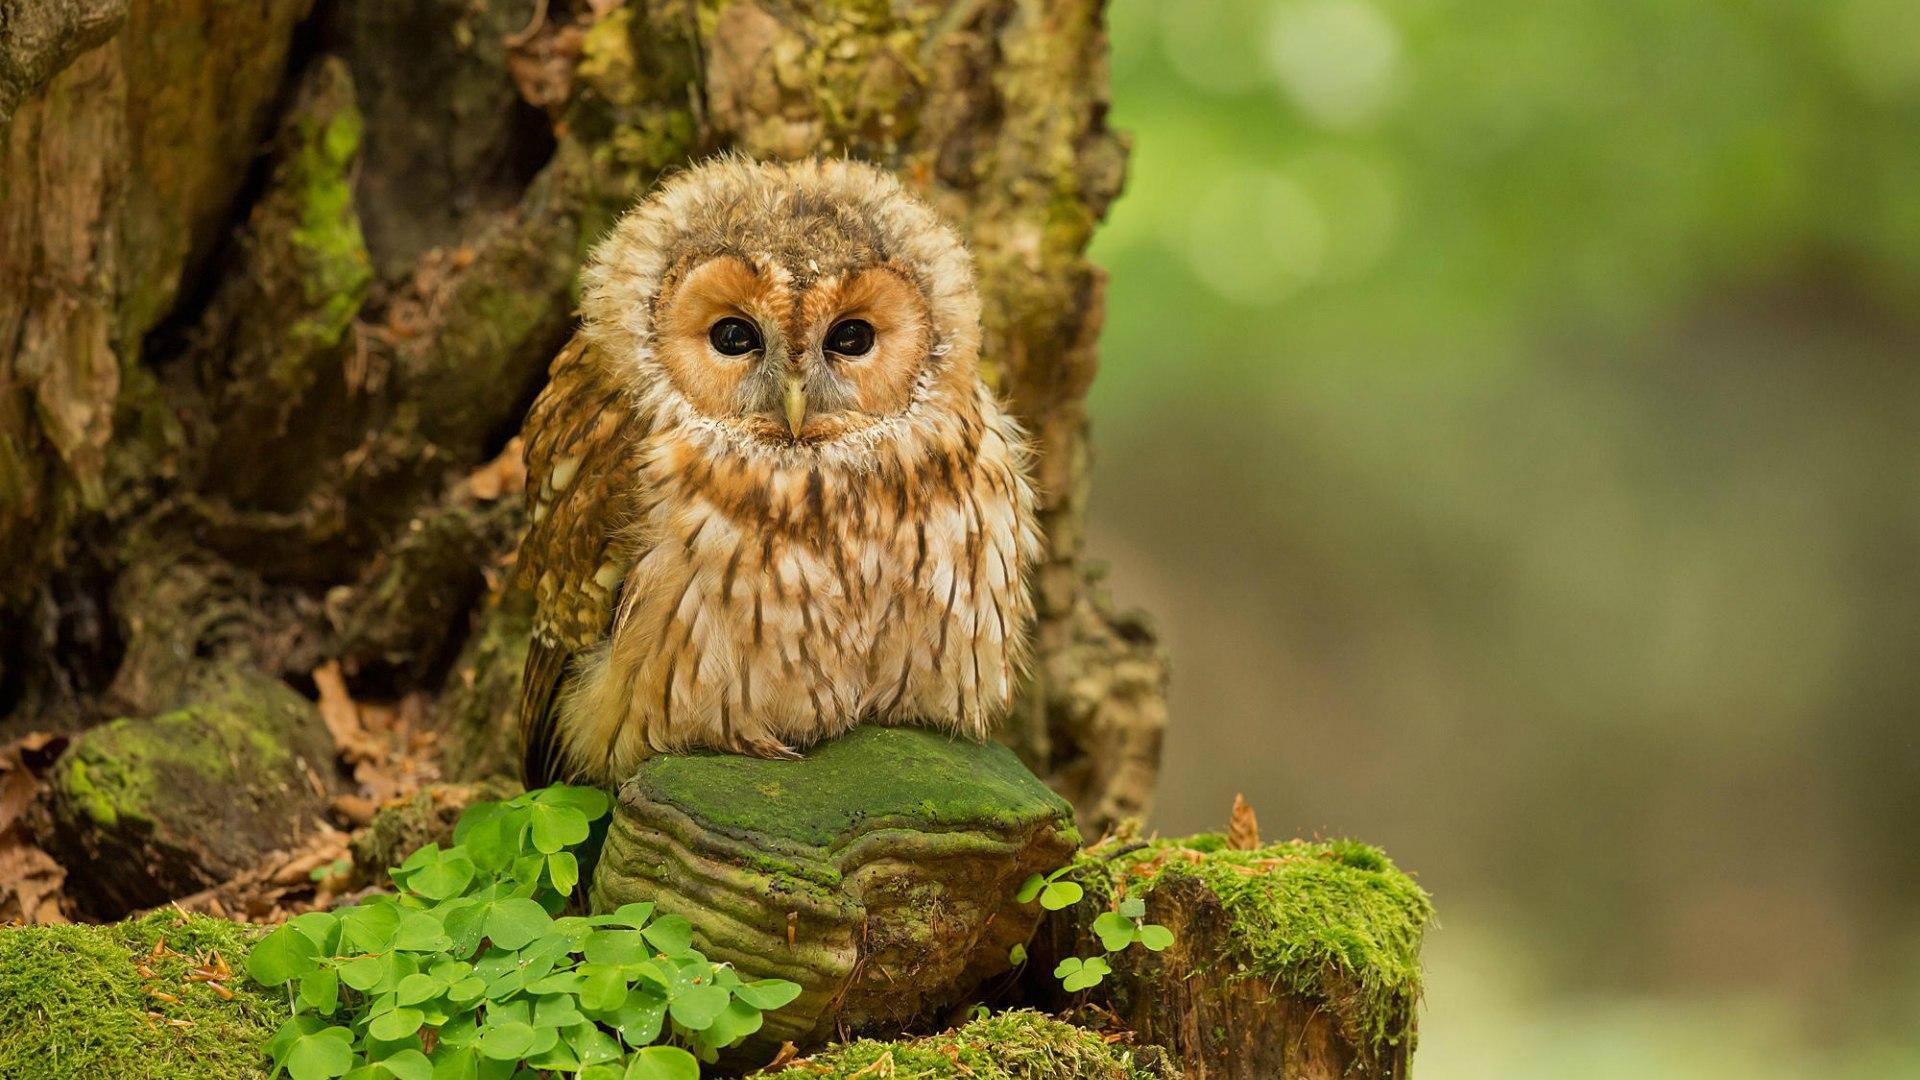 Owl Glasses Images Stock Photos amp Vectors  Shutterstock